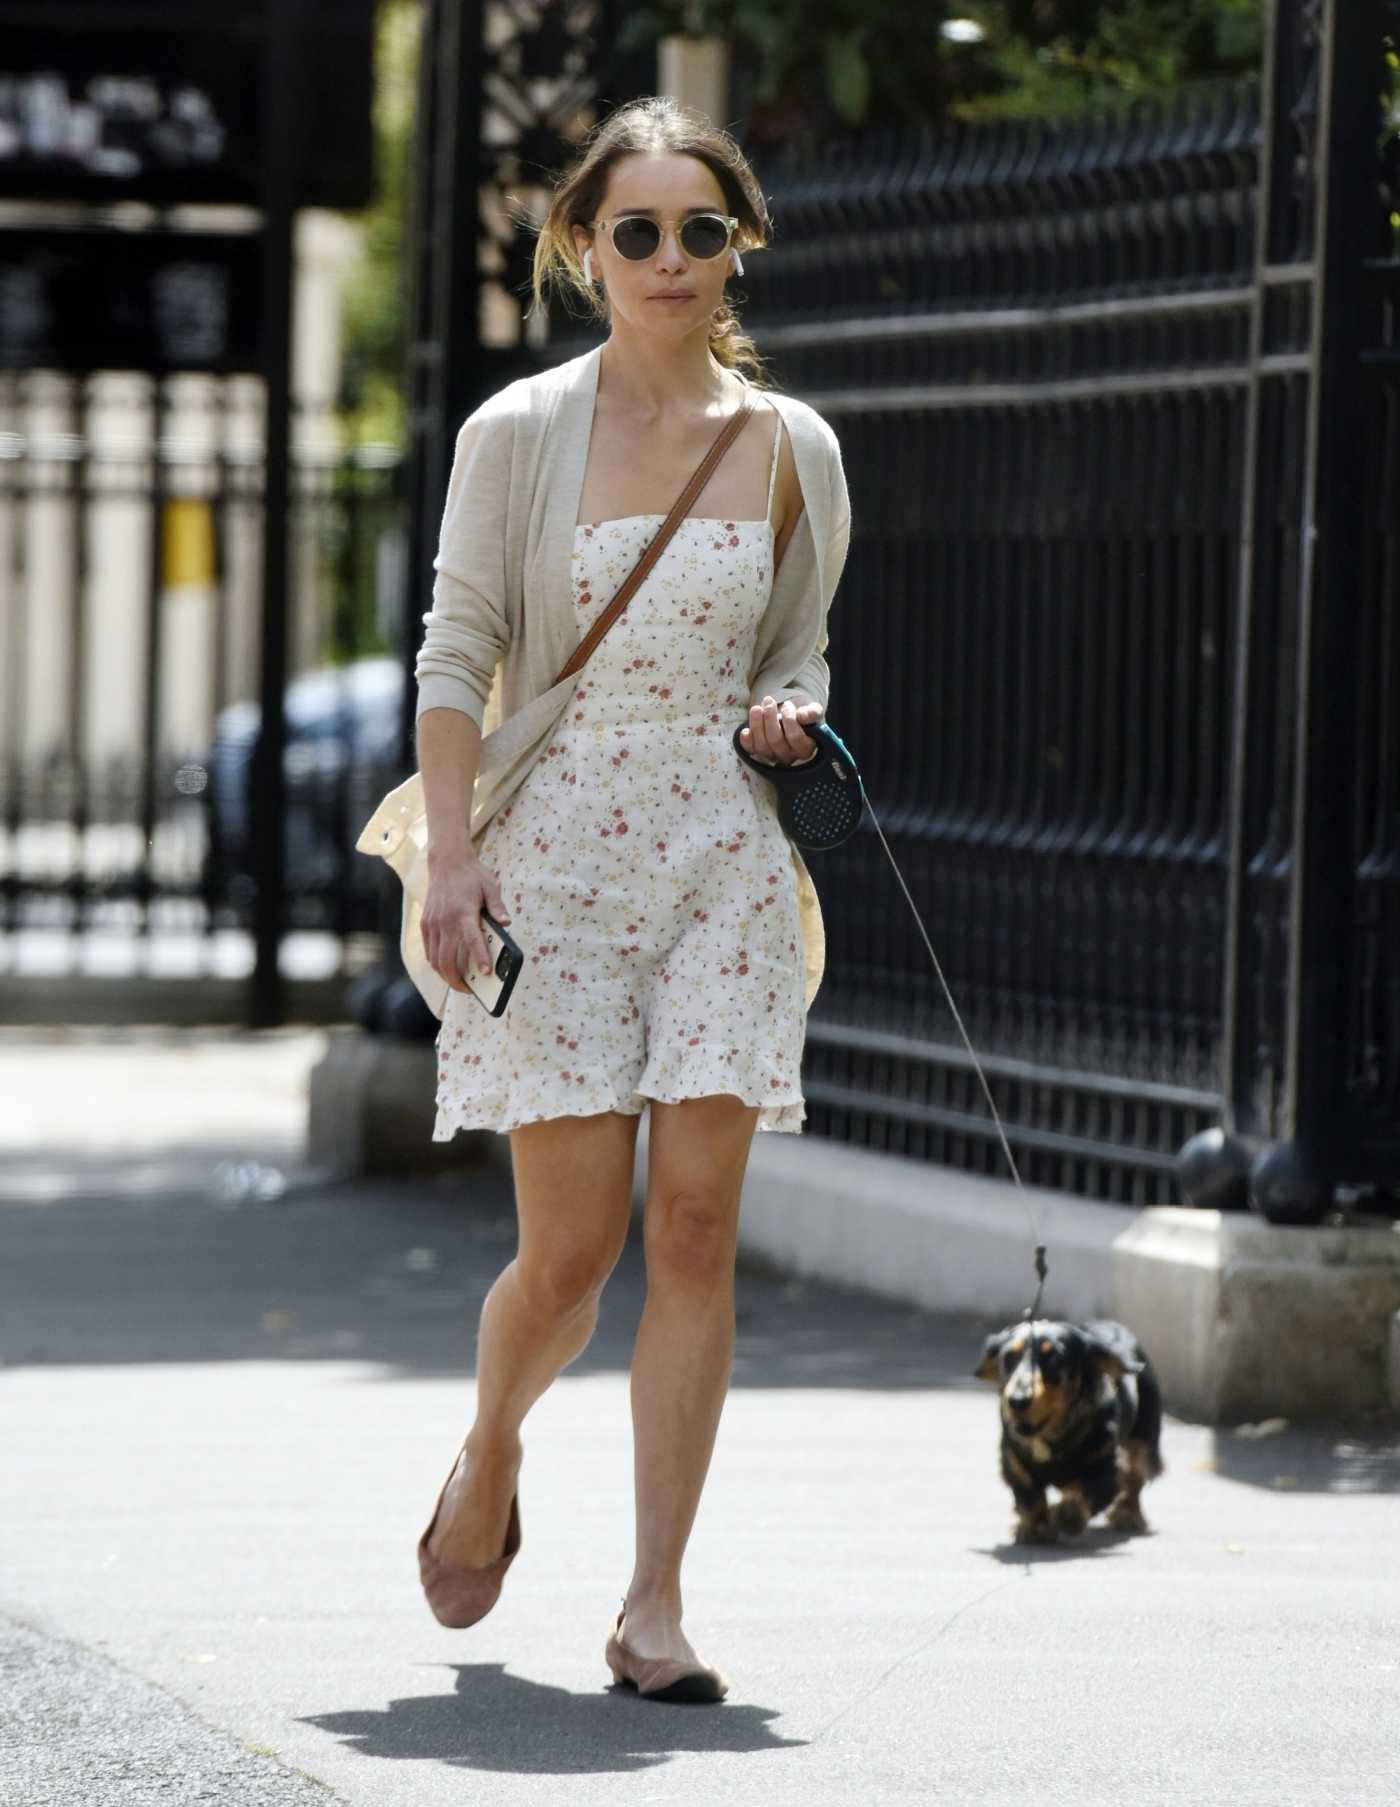 Emilia Clarke in a White Floral Dress Walks Her Dog in London 07/13/2020